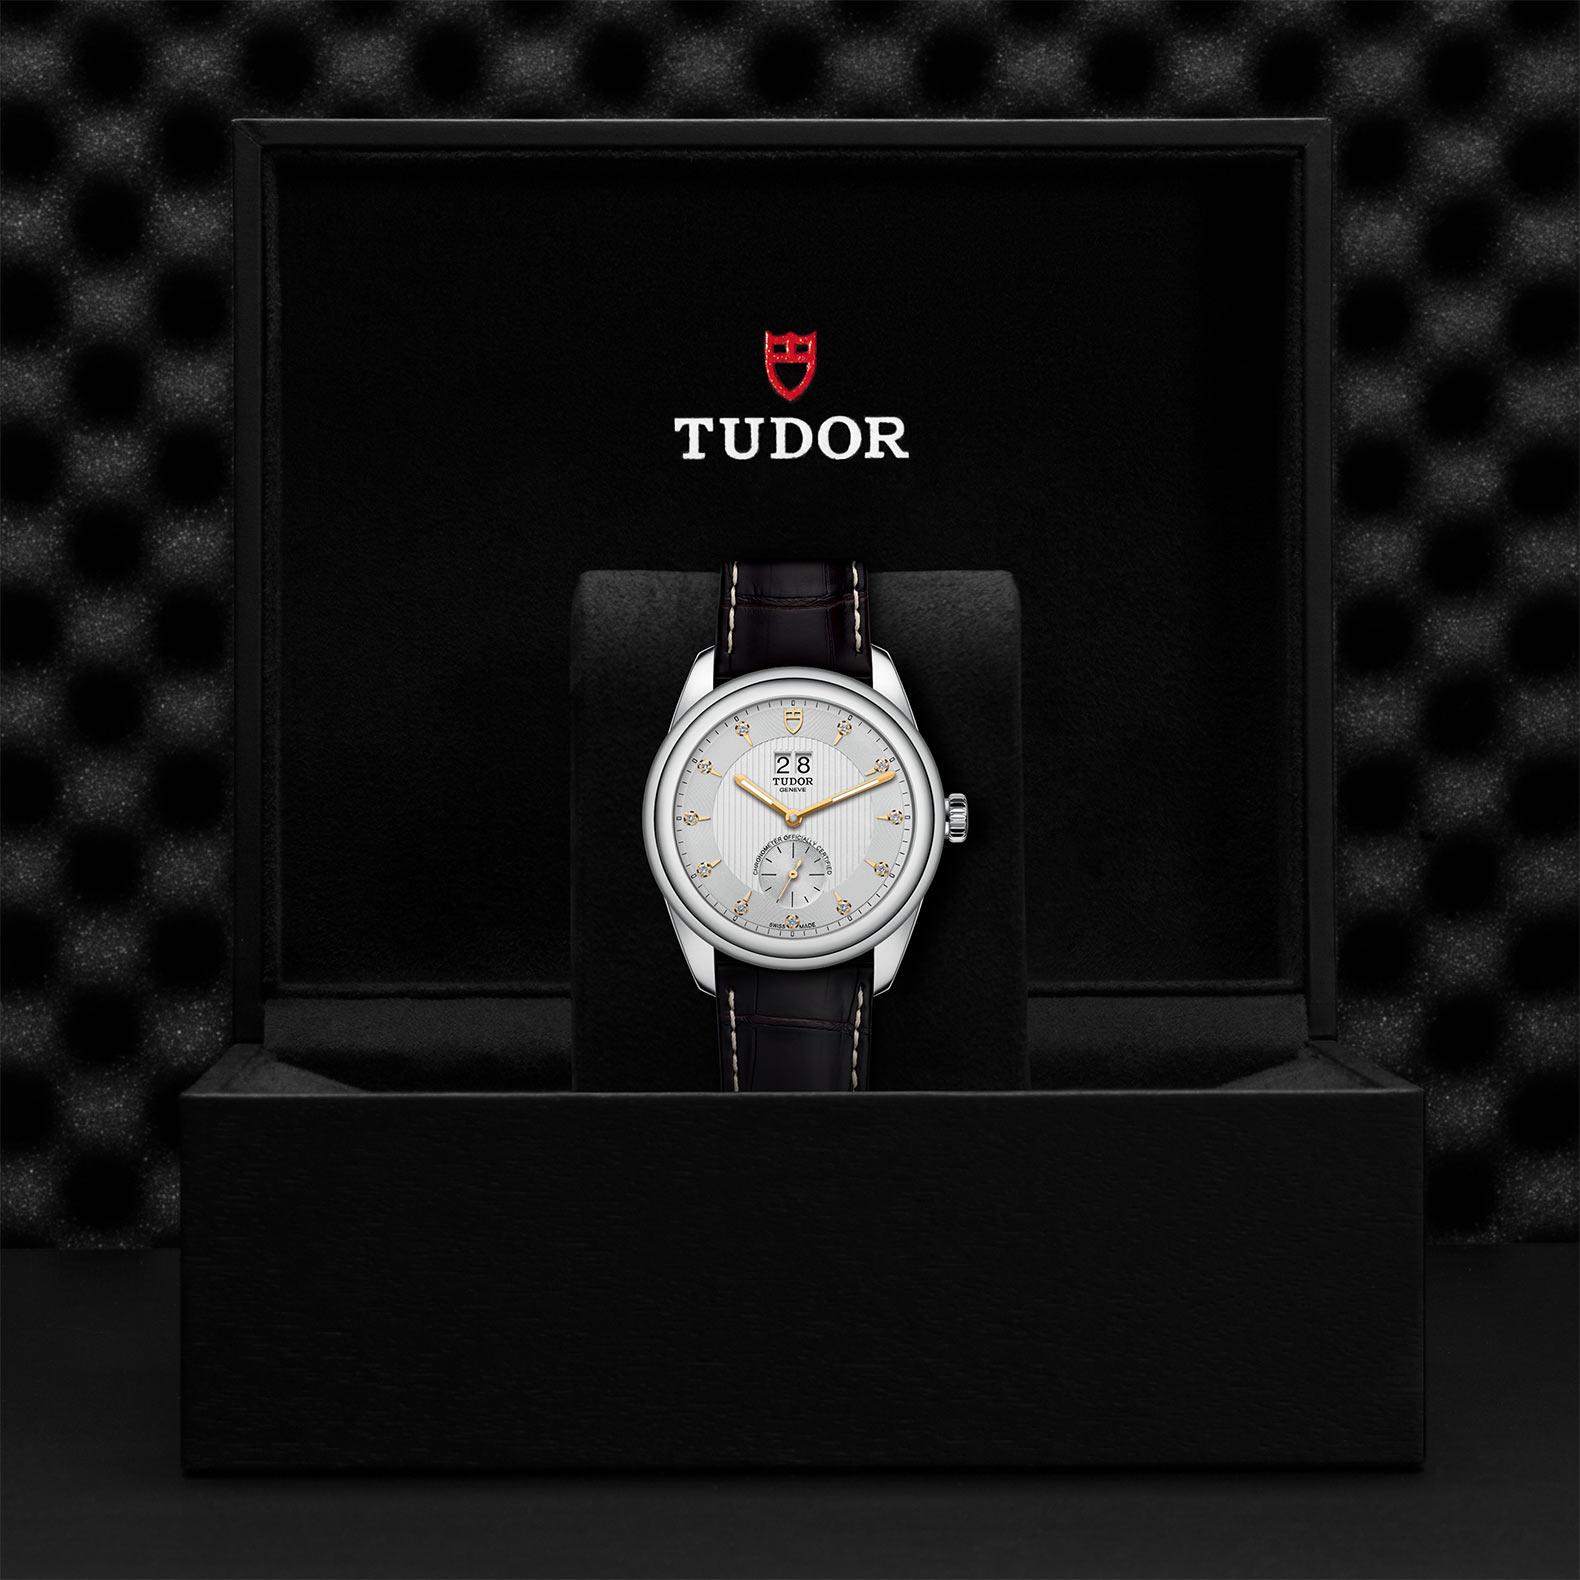 TUDOR Glamour Double Date M57100 0020 Presentationbox